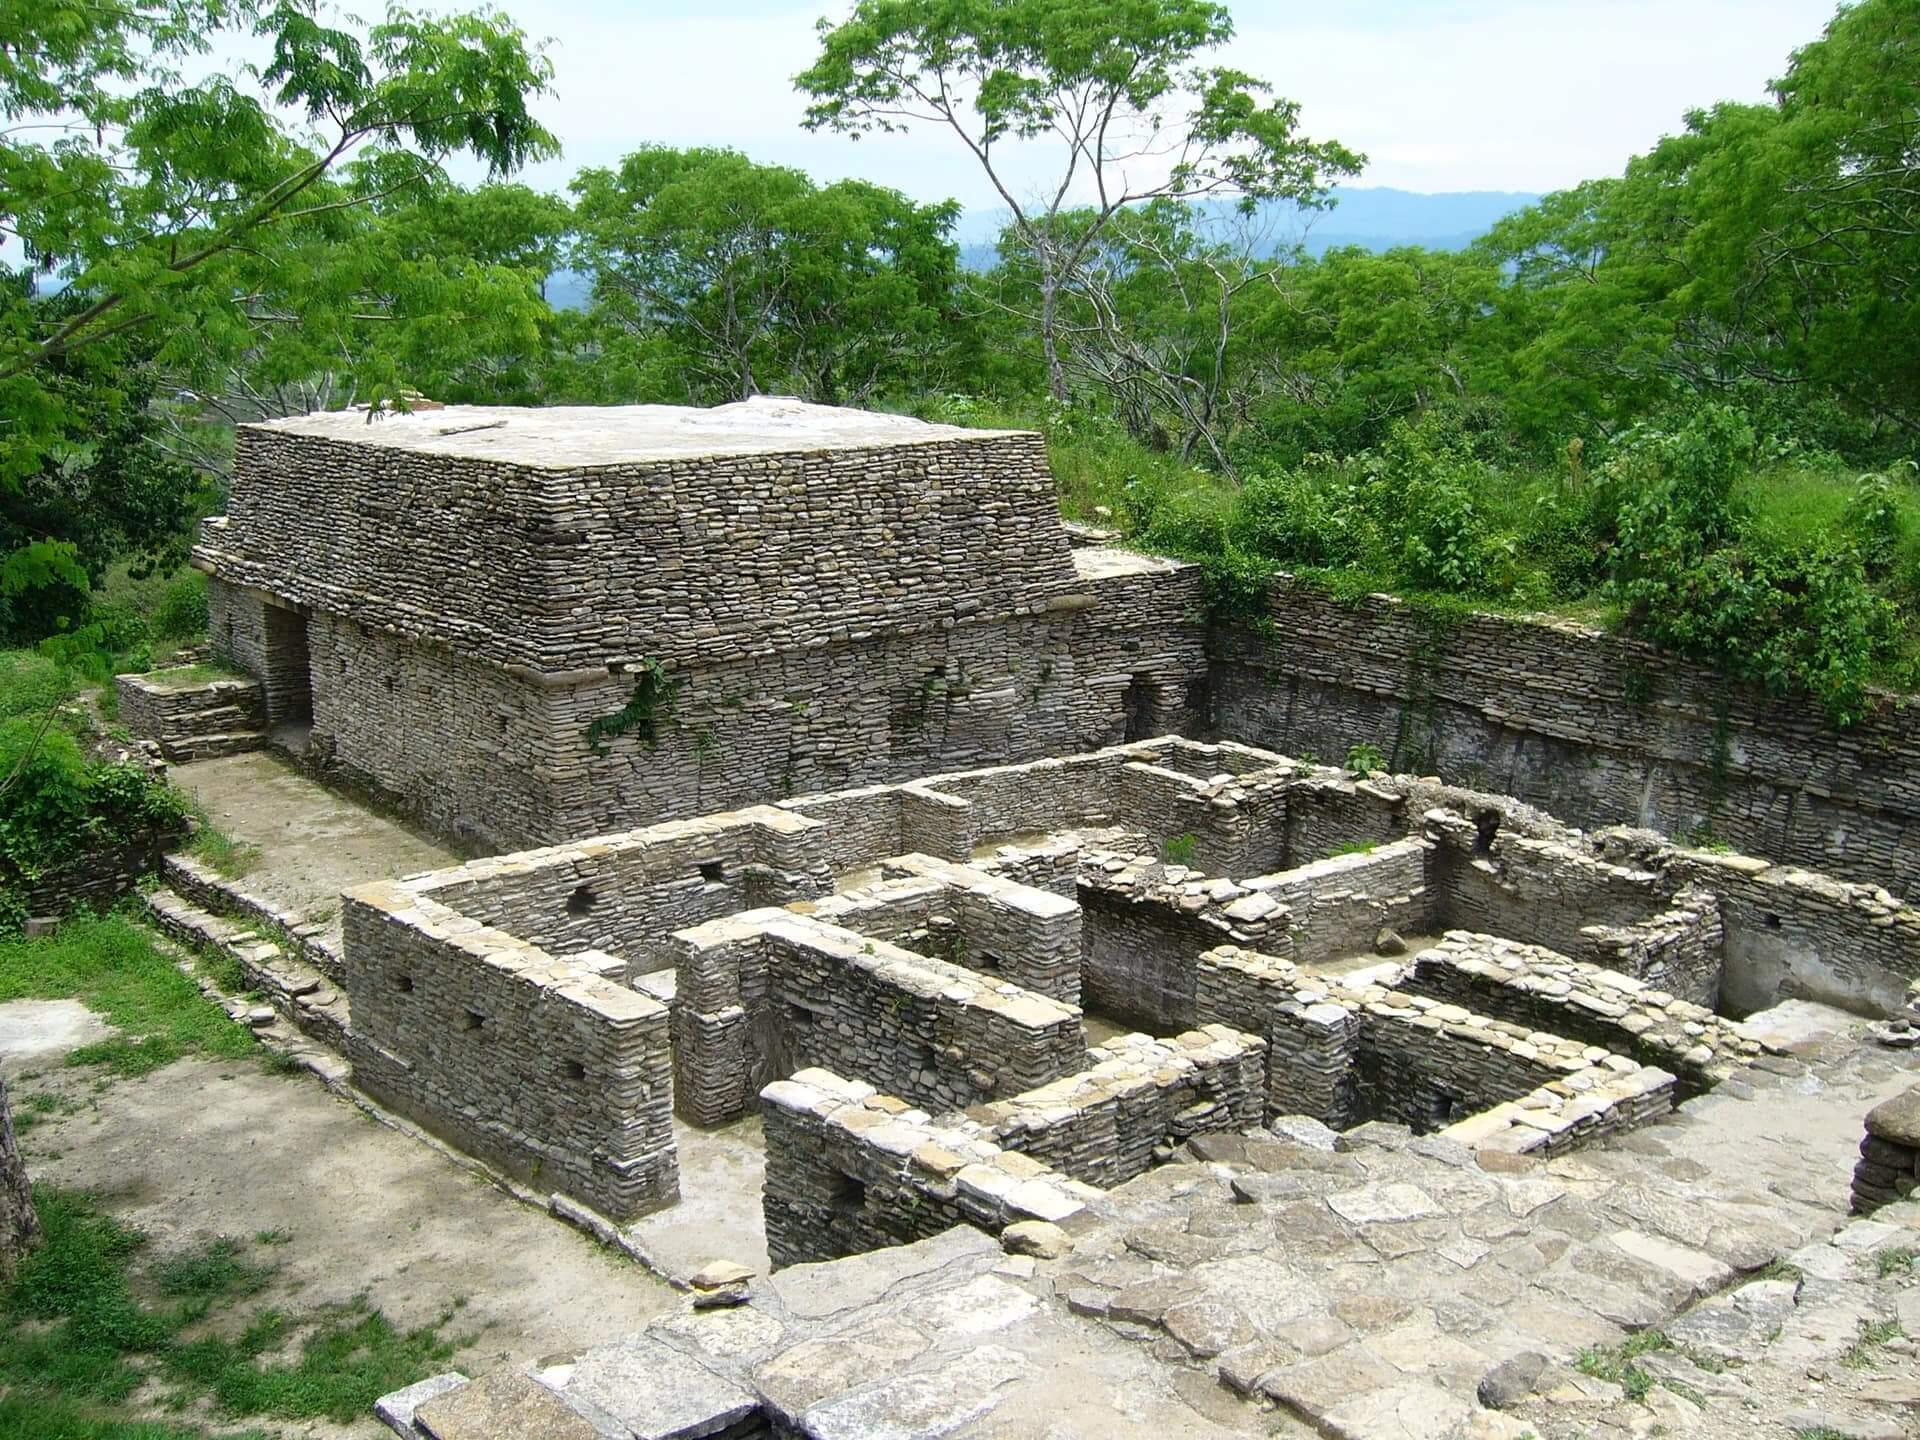 viaje arqueológico al mundo maya Tonina